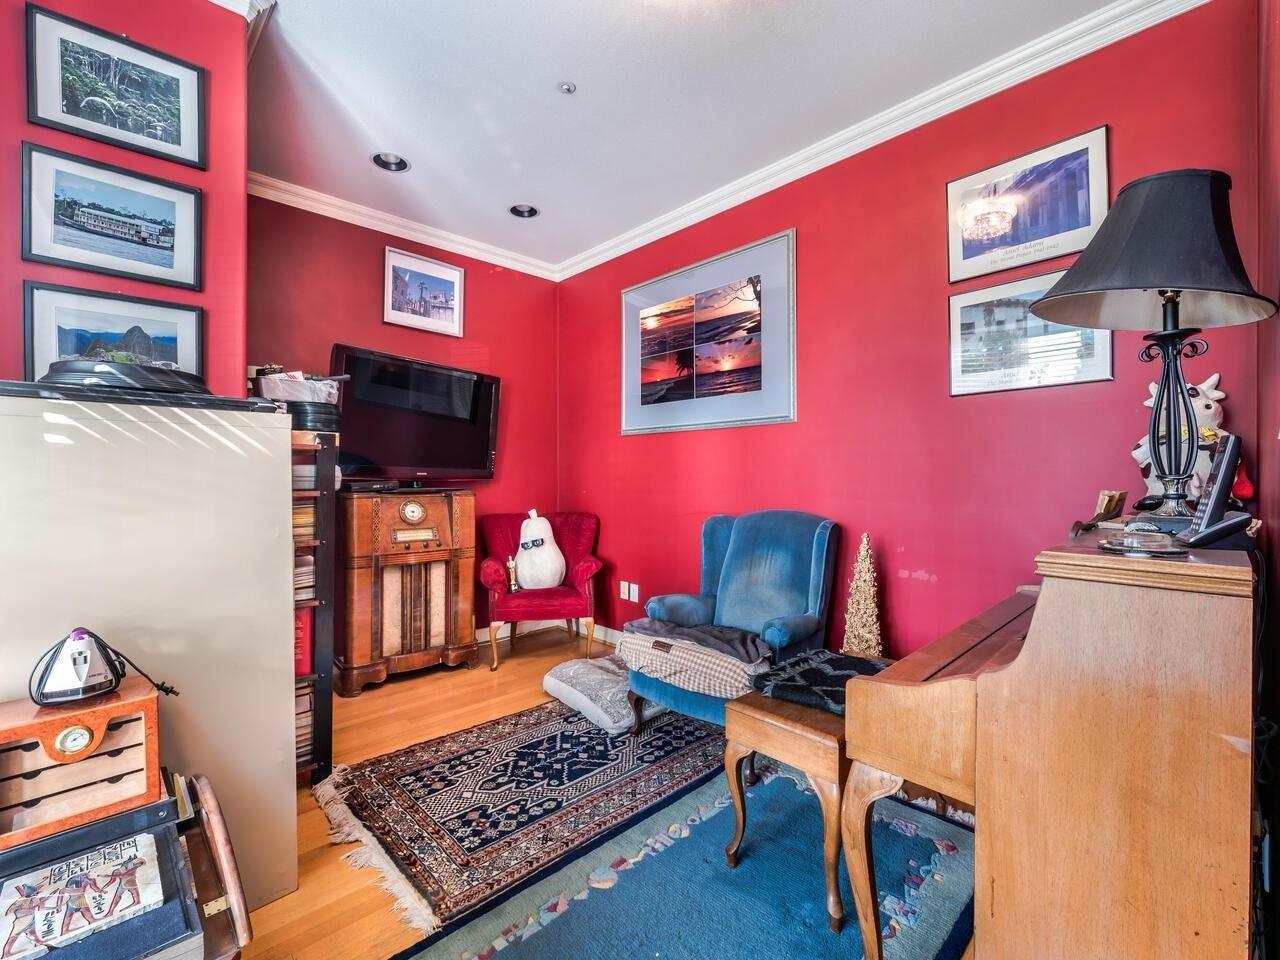 7888 JASPER CRESCENT - Fraserview VE House/Single Family for sale, 7 Bedrooms (R2622945) - #4